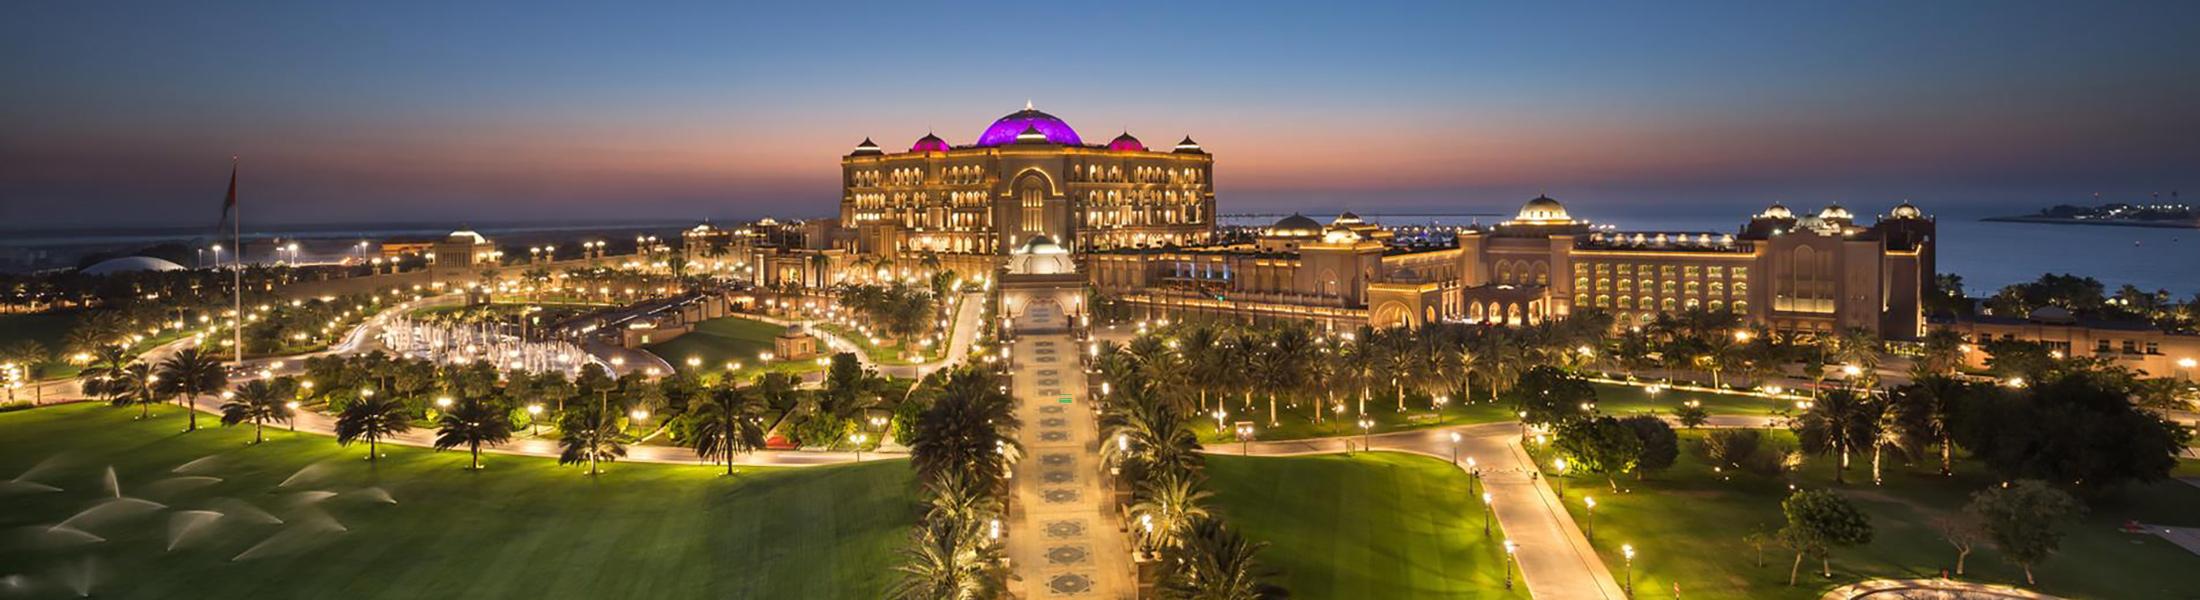 Exterior at night of Emirates Palace